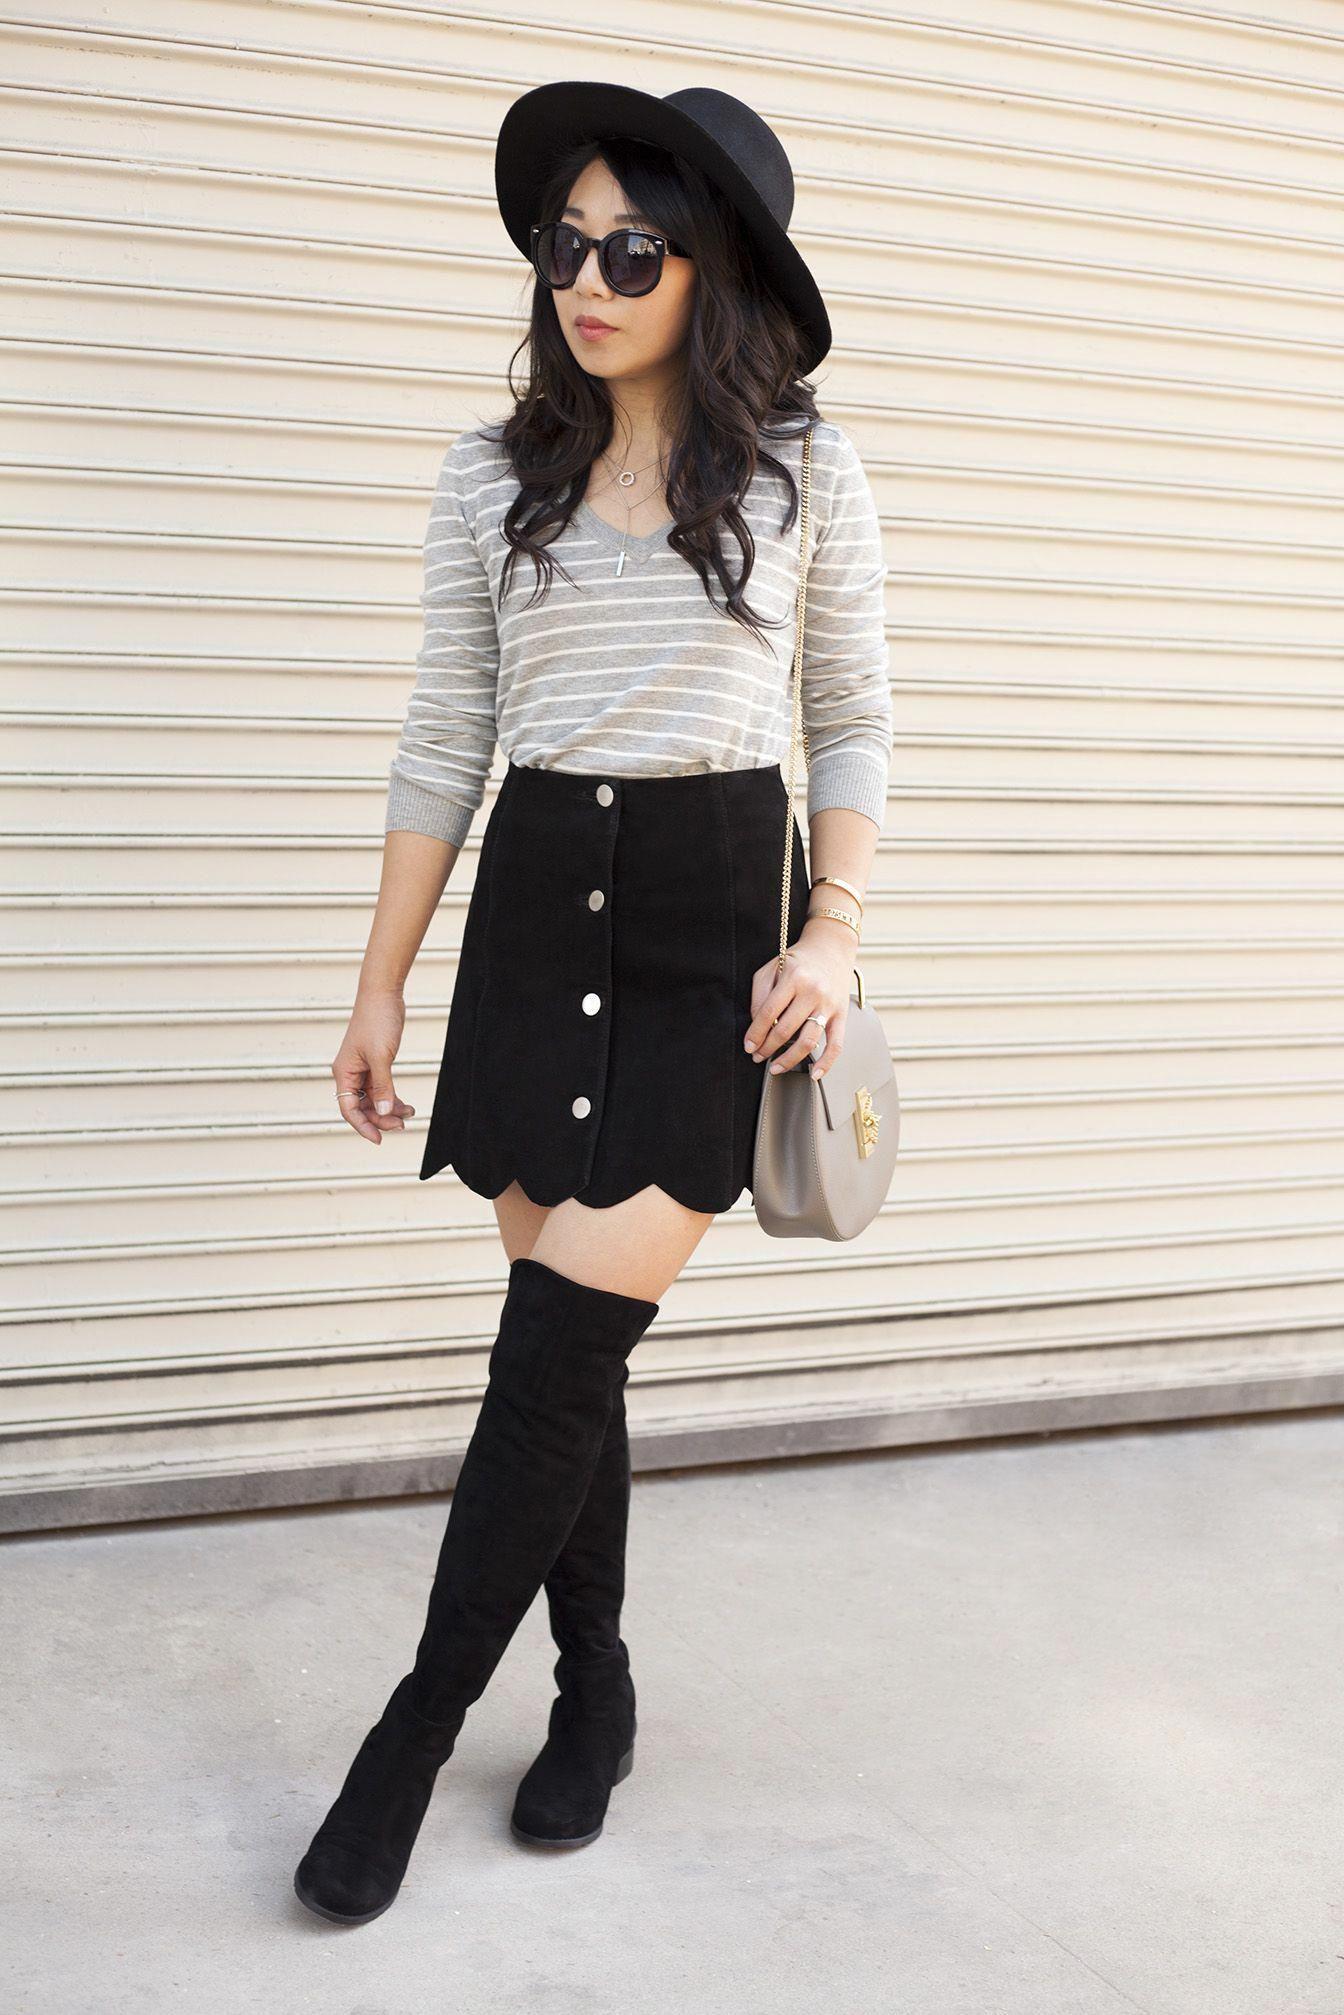 28eabc3da78 poshclassymom-suede-button-front-skirt-boho-stuart-weitzman-5050-boots-chloe-drew-striped-top-flop-hat-black-and-gray  (1)  StuartWeitzman